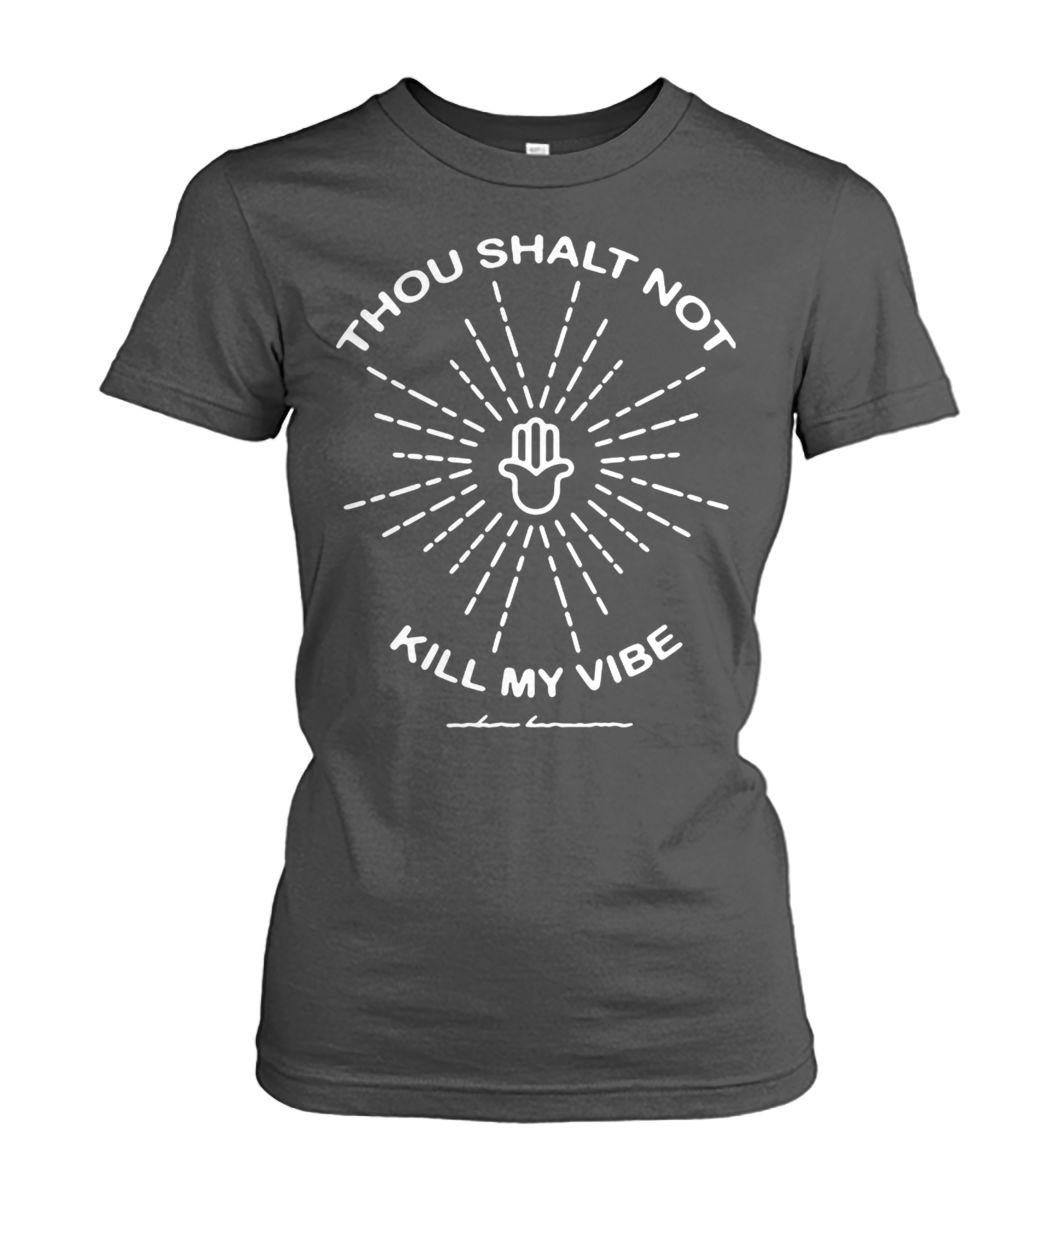 [Hot version] Thou shalt not kill my vibe shirt